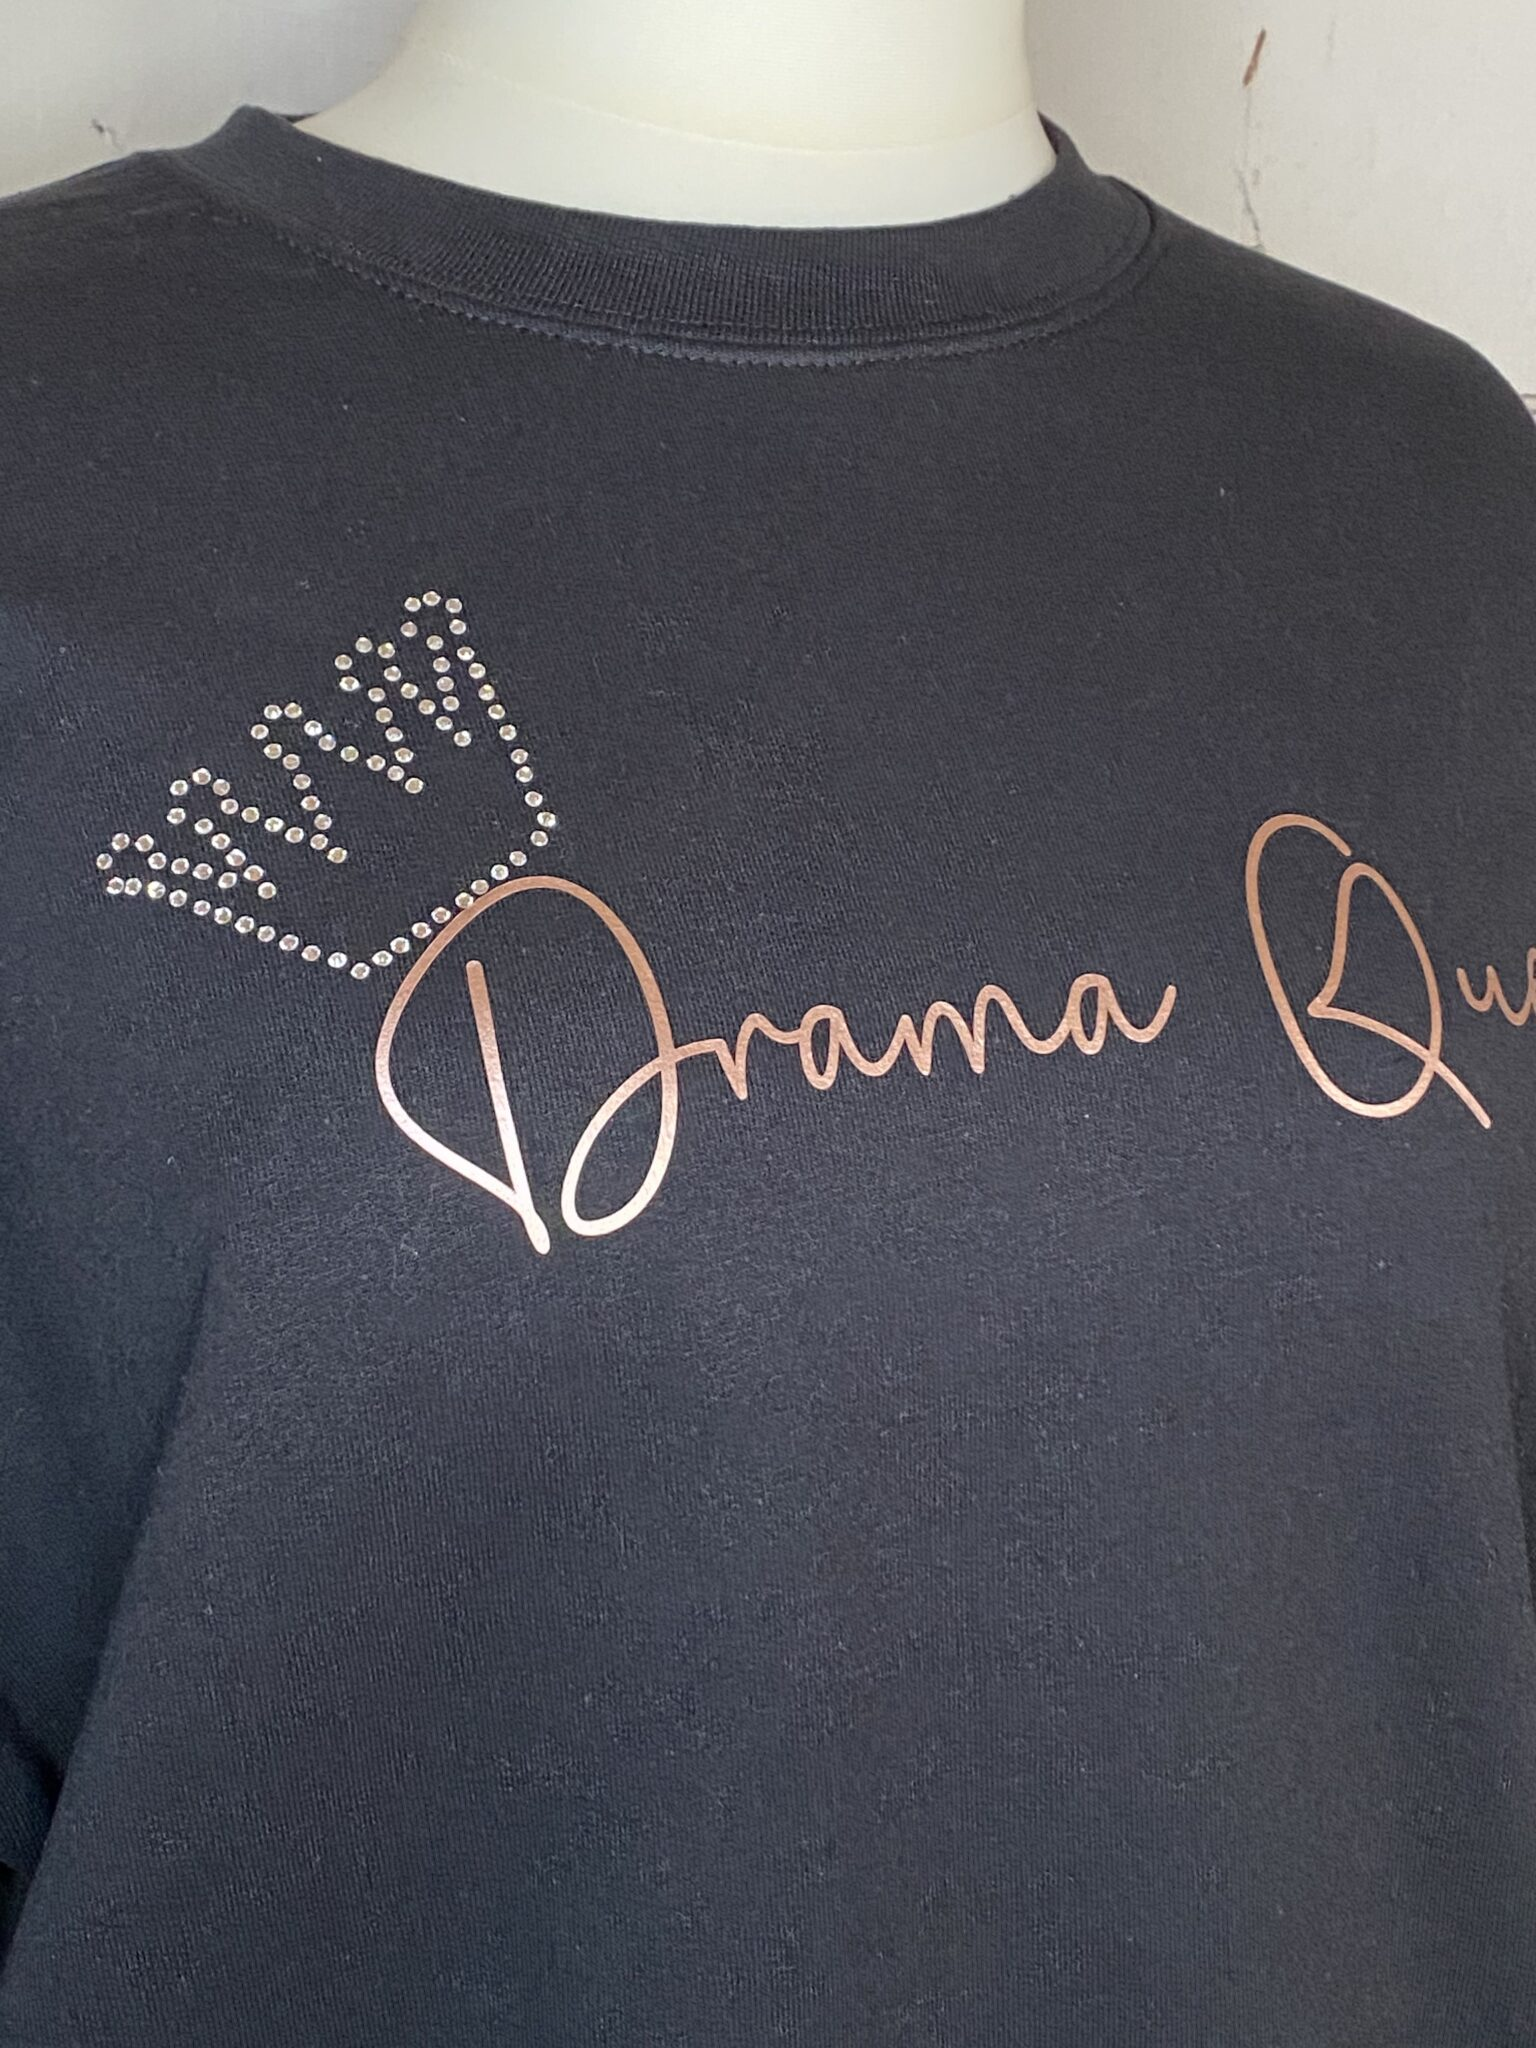 Drama Queen Rhinestone Sweatshirt Close Up